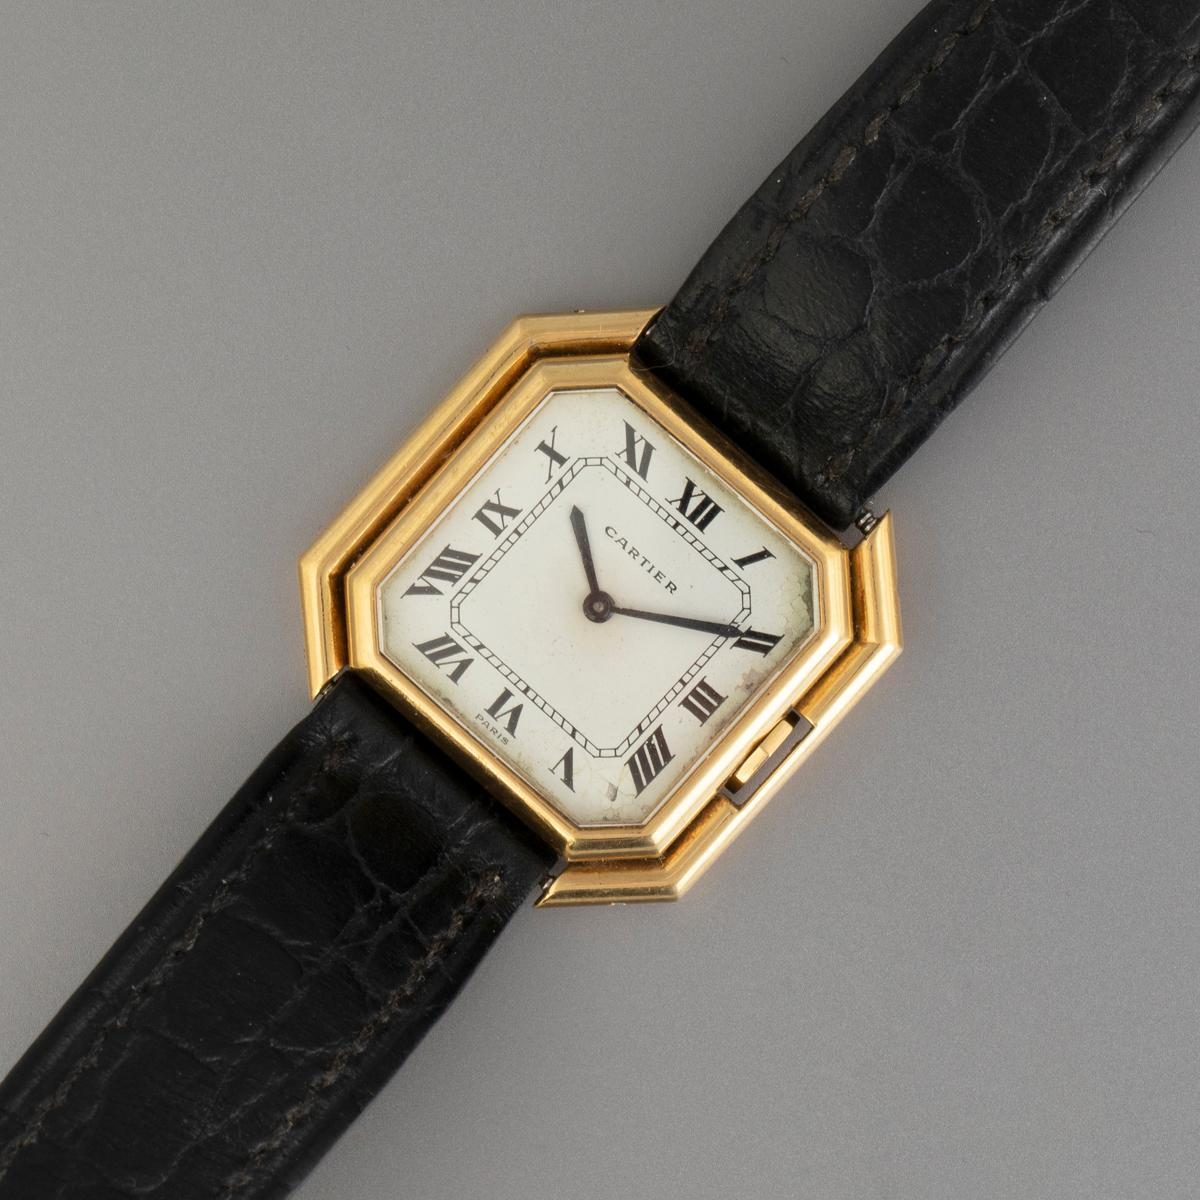 Cartier Ceinture Automatic Gold Wristwatch